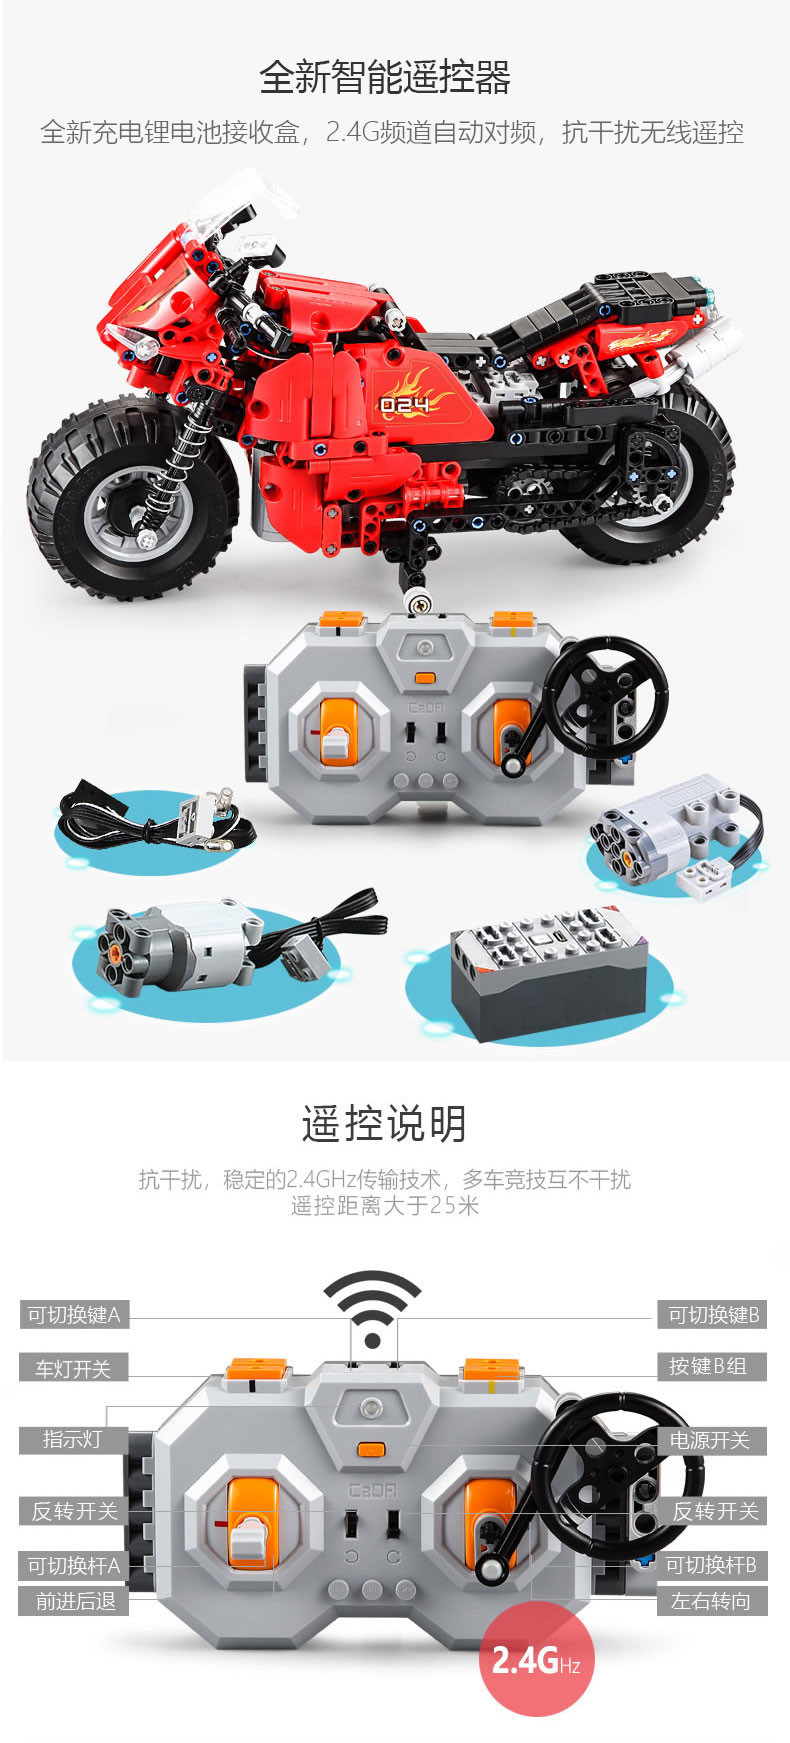 DoubleE / CADA C51024 Track Motorcycles 6